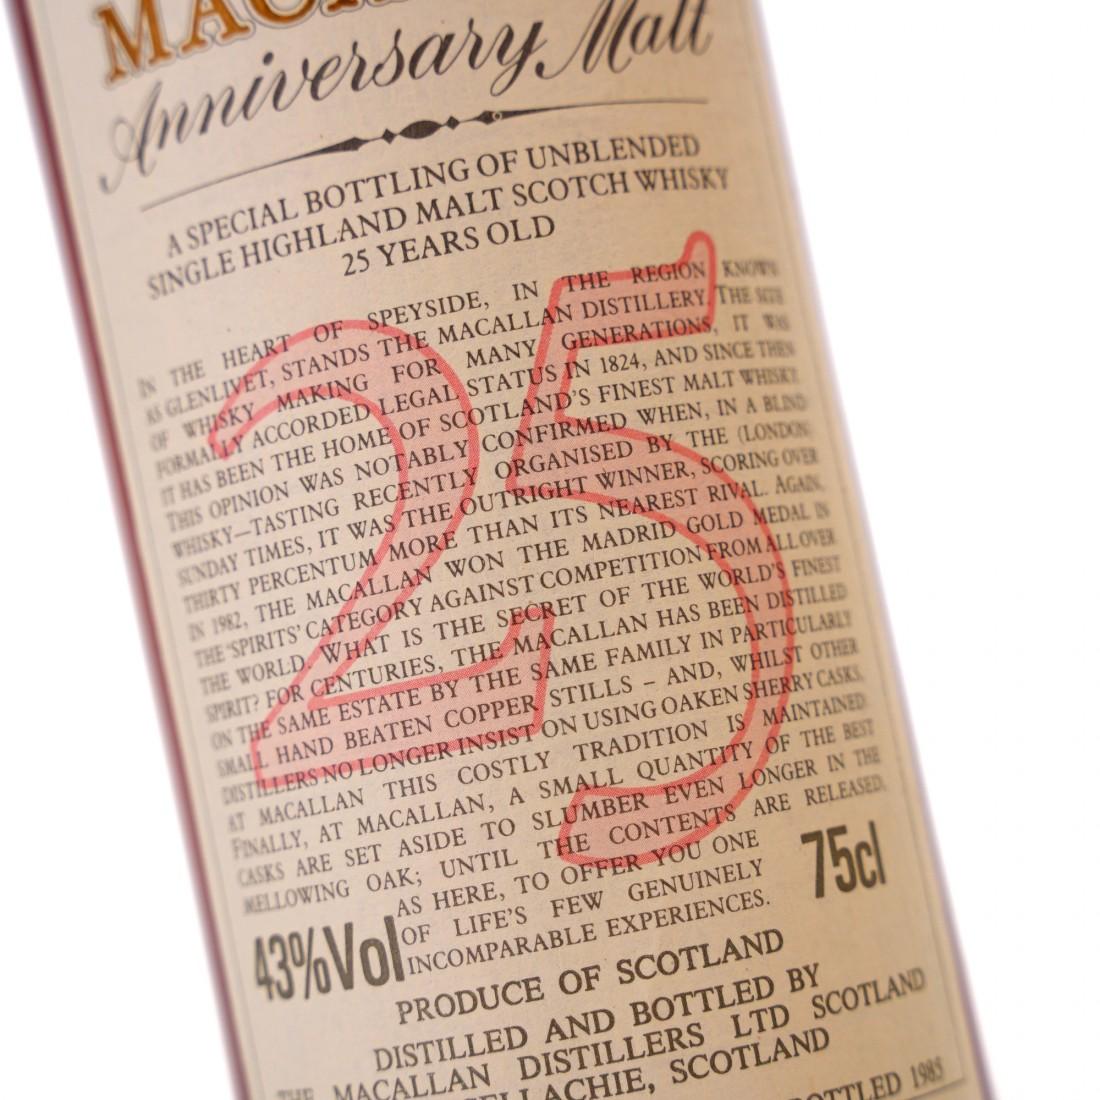 Macallan 1958/59 Anniversary Malt 25 Year Old